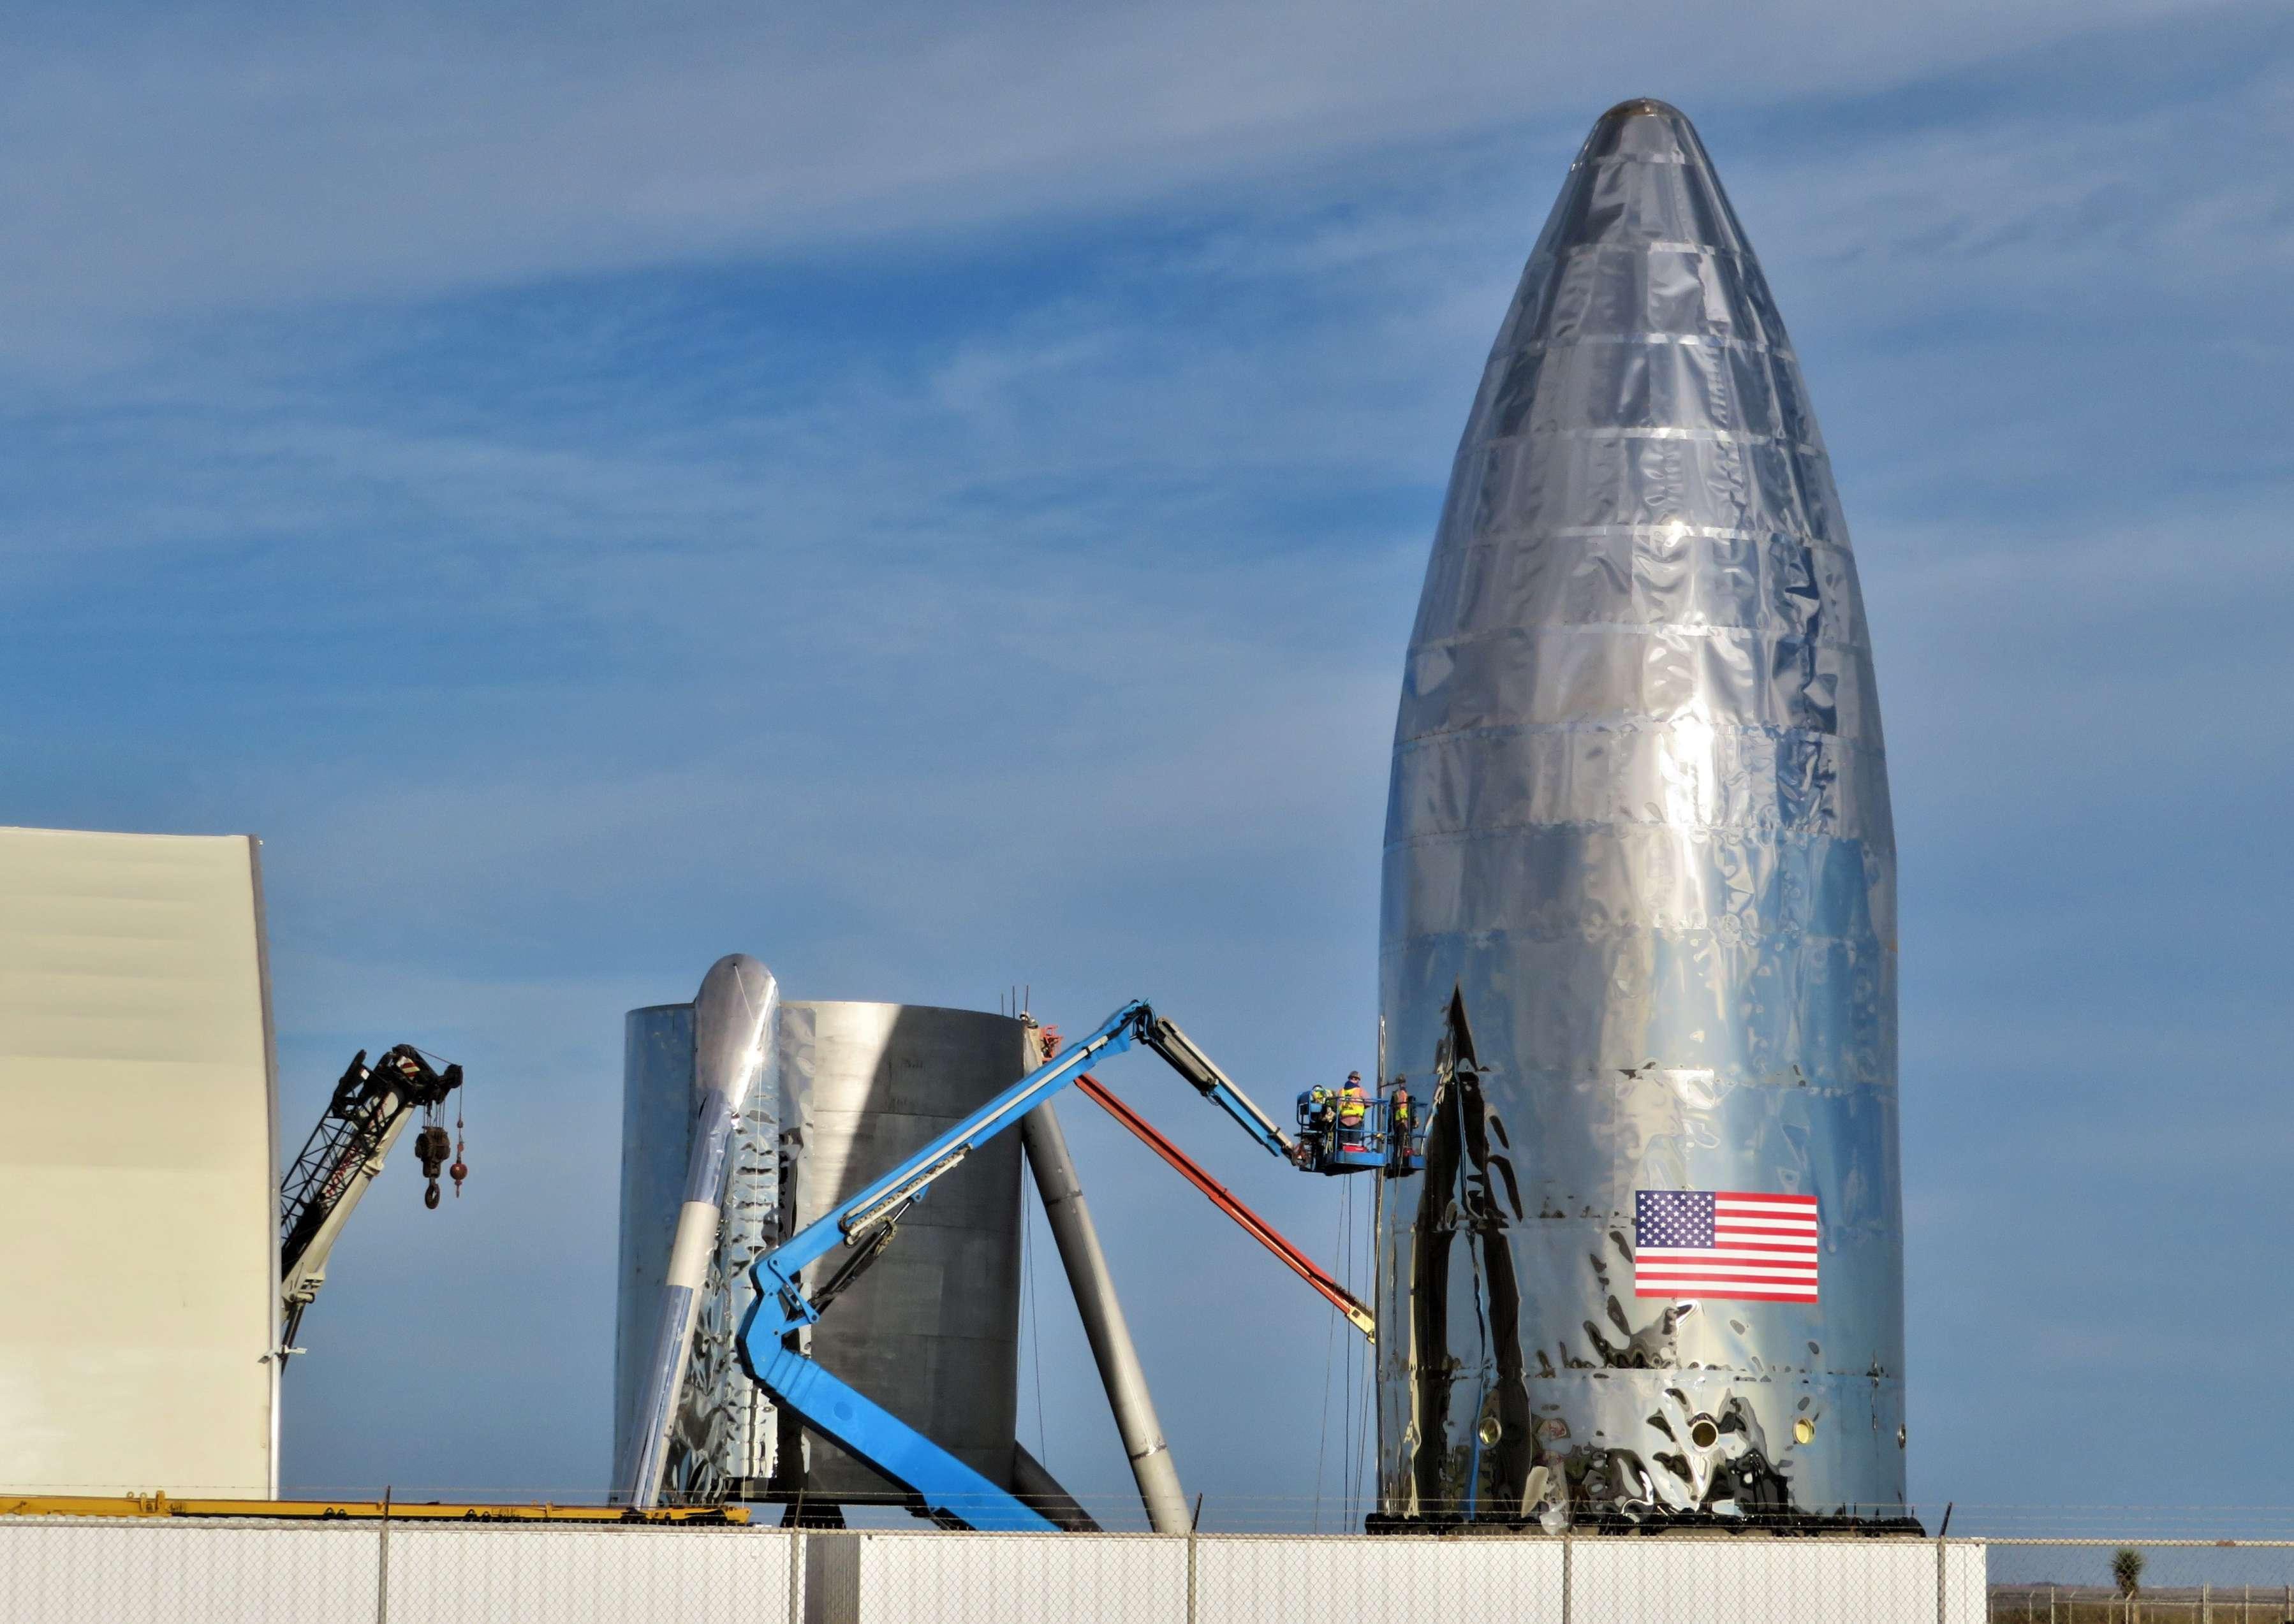 Boca Chica Starship Alpha progress 010618 (NSF – bocachicagal) 1(c)